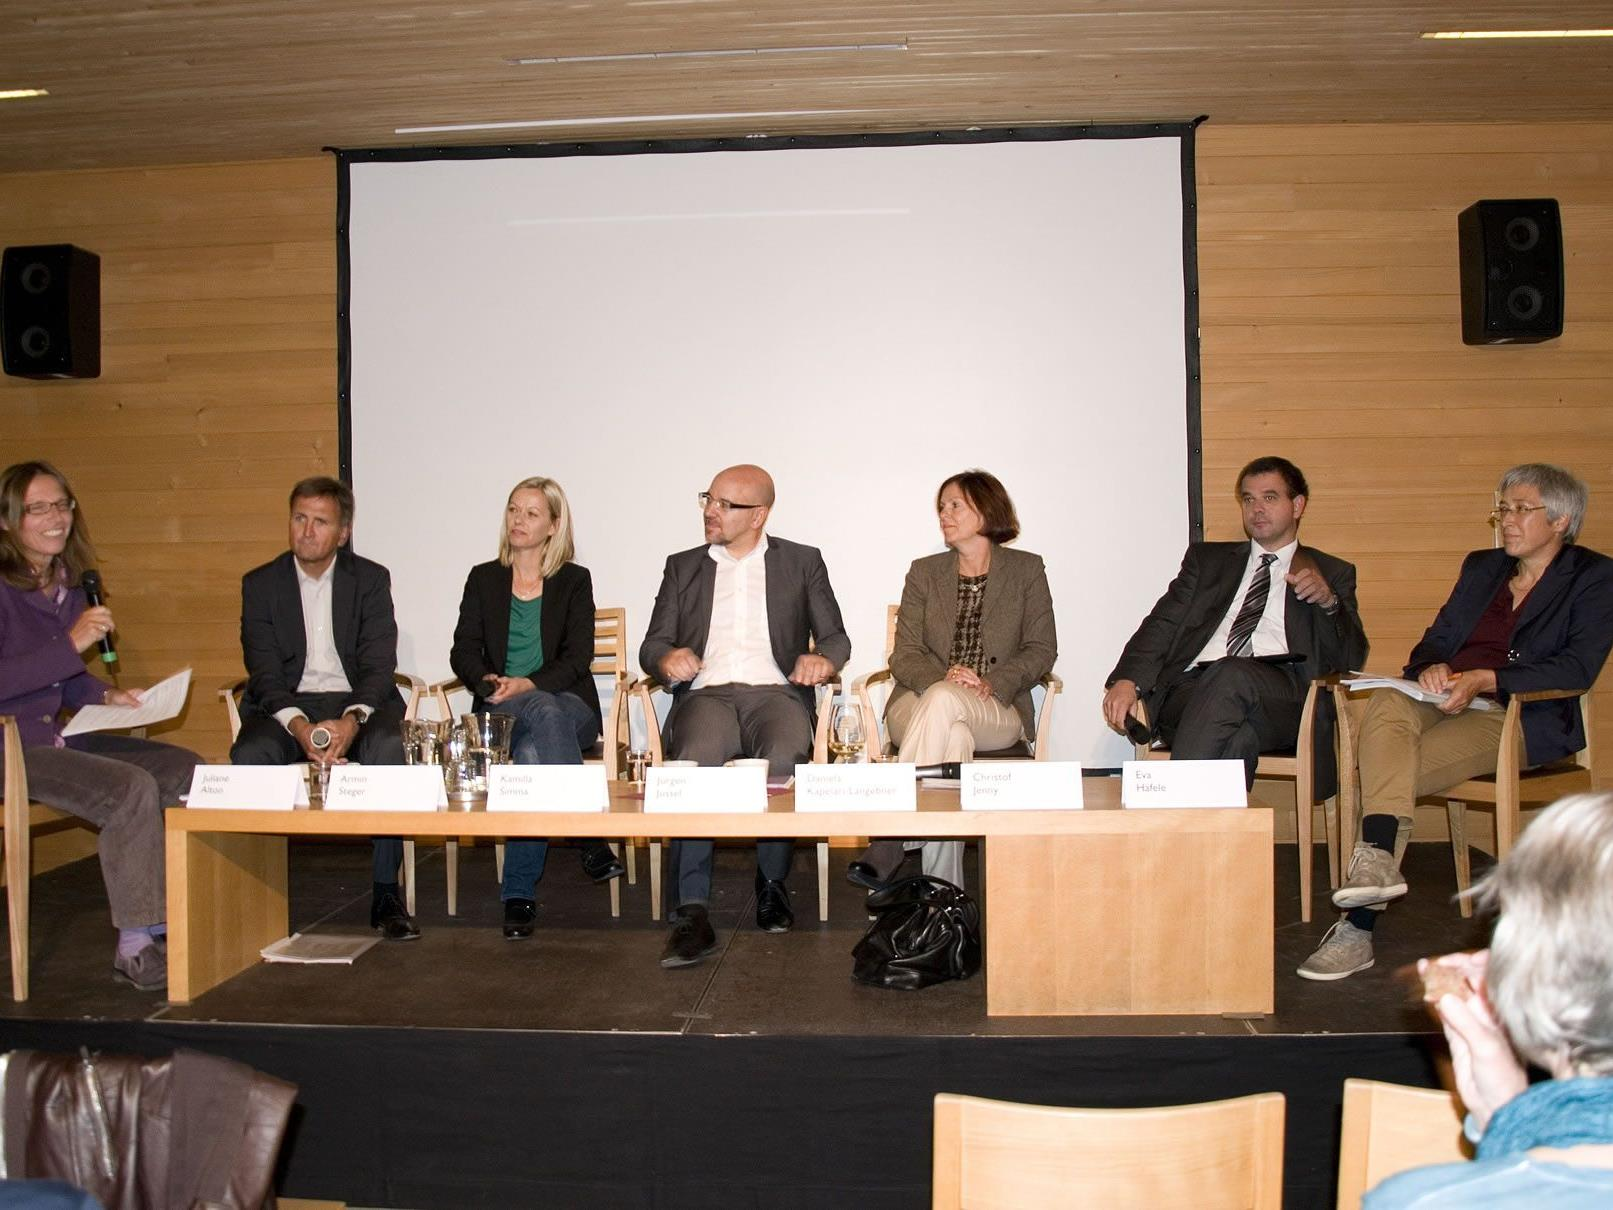 Am Podium diskutierten: Kamila Simma, Jürgen Jussel, Christoph Jenny, Daniel Kapelari-Langebner, Eva Häfele, Armin Steger und Juliane Alton.